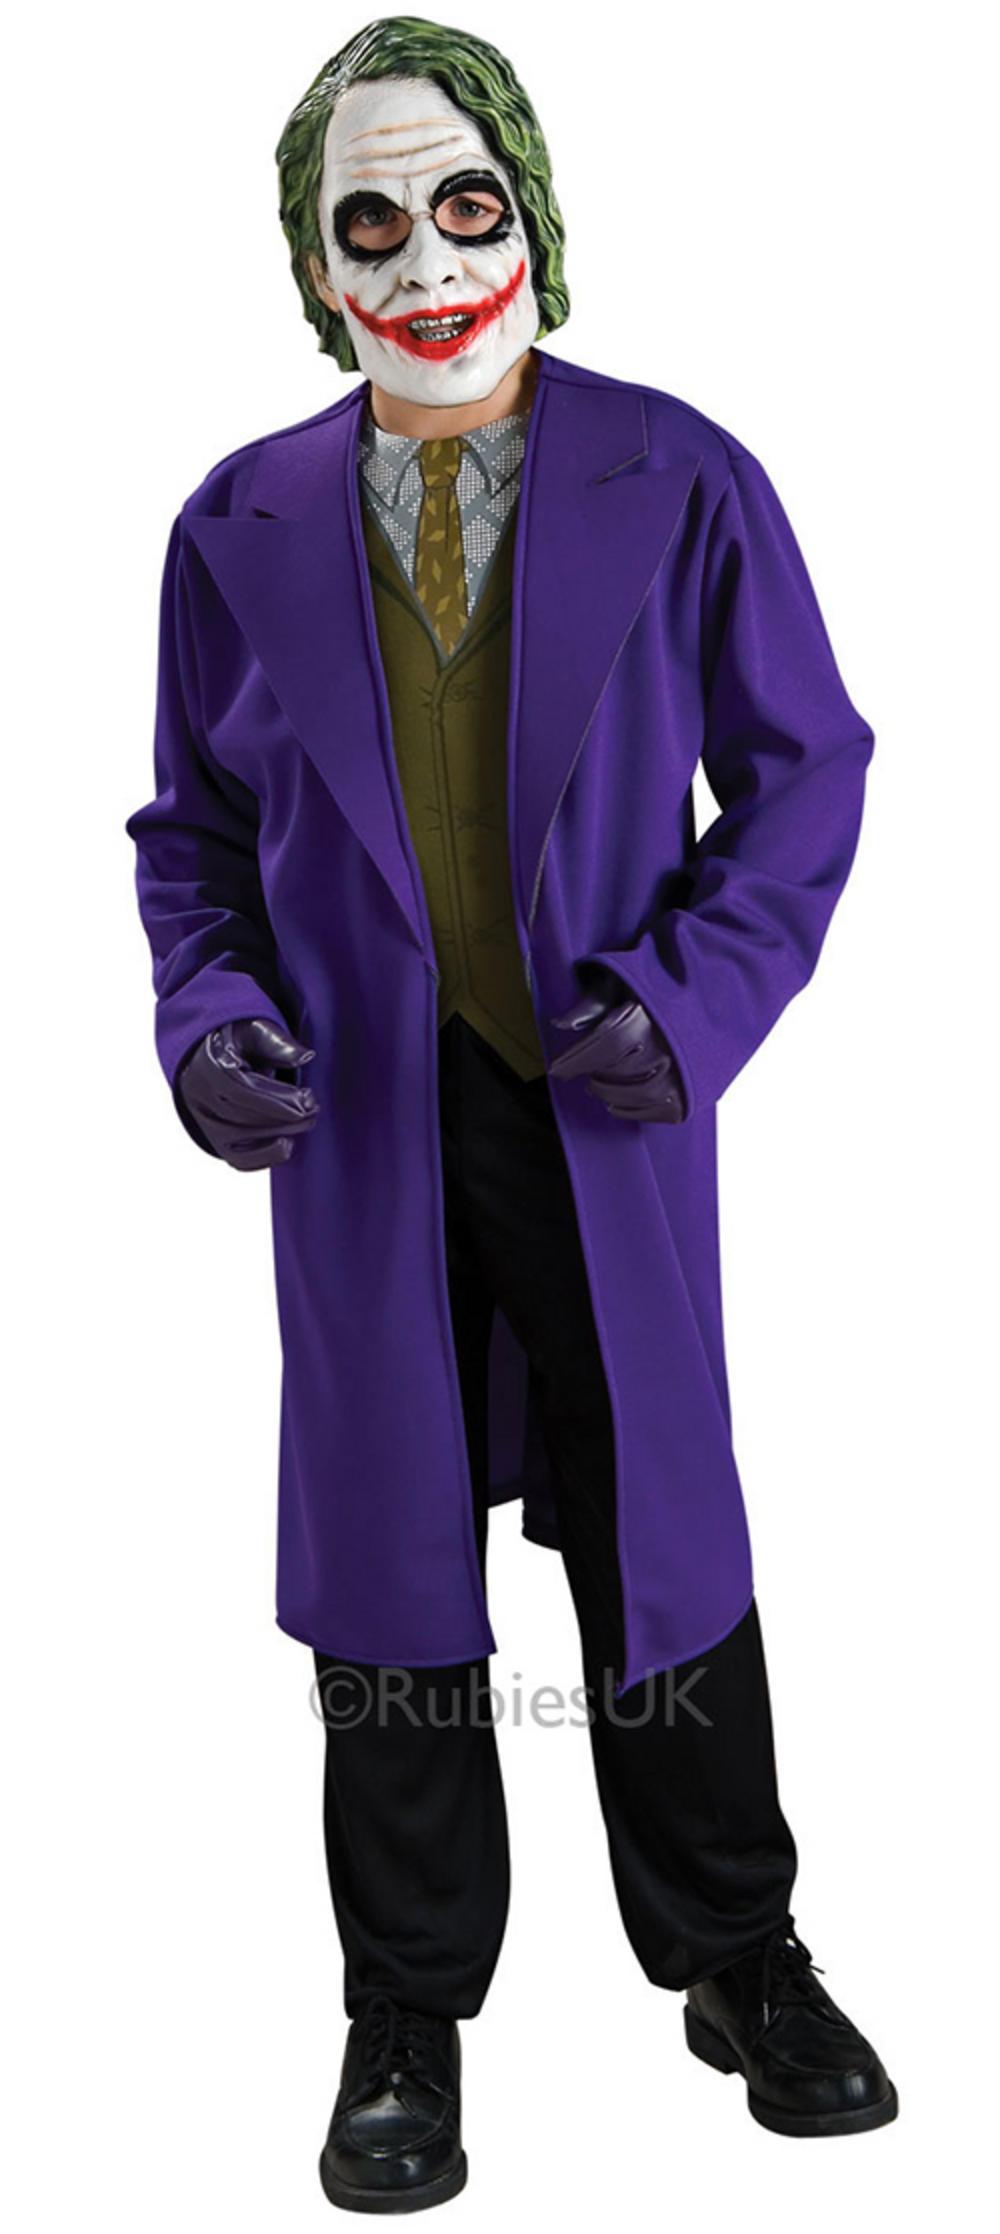 boy 39 s batman deluxe joker fancy dress costume tv book and film costumes mega fancy dress. Black Bedroom Furniture Sets. Home Design Ideas